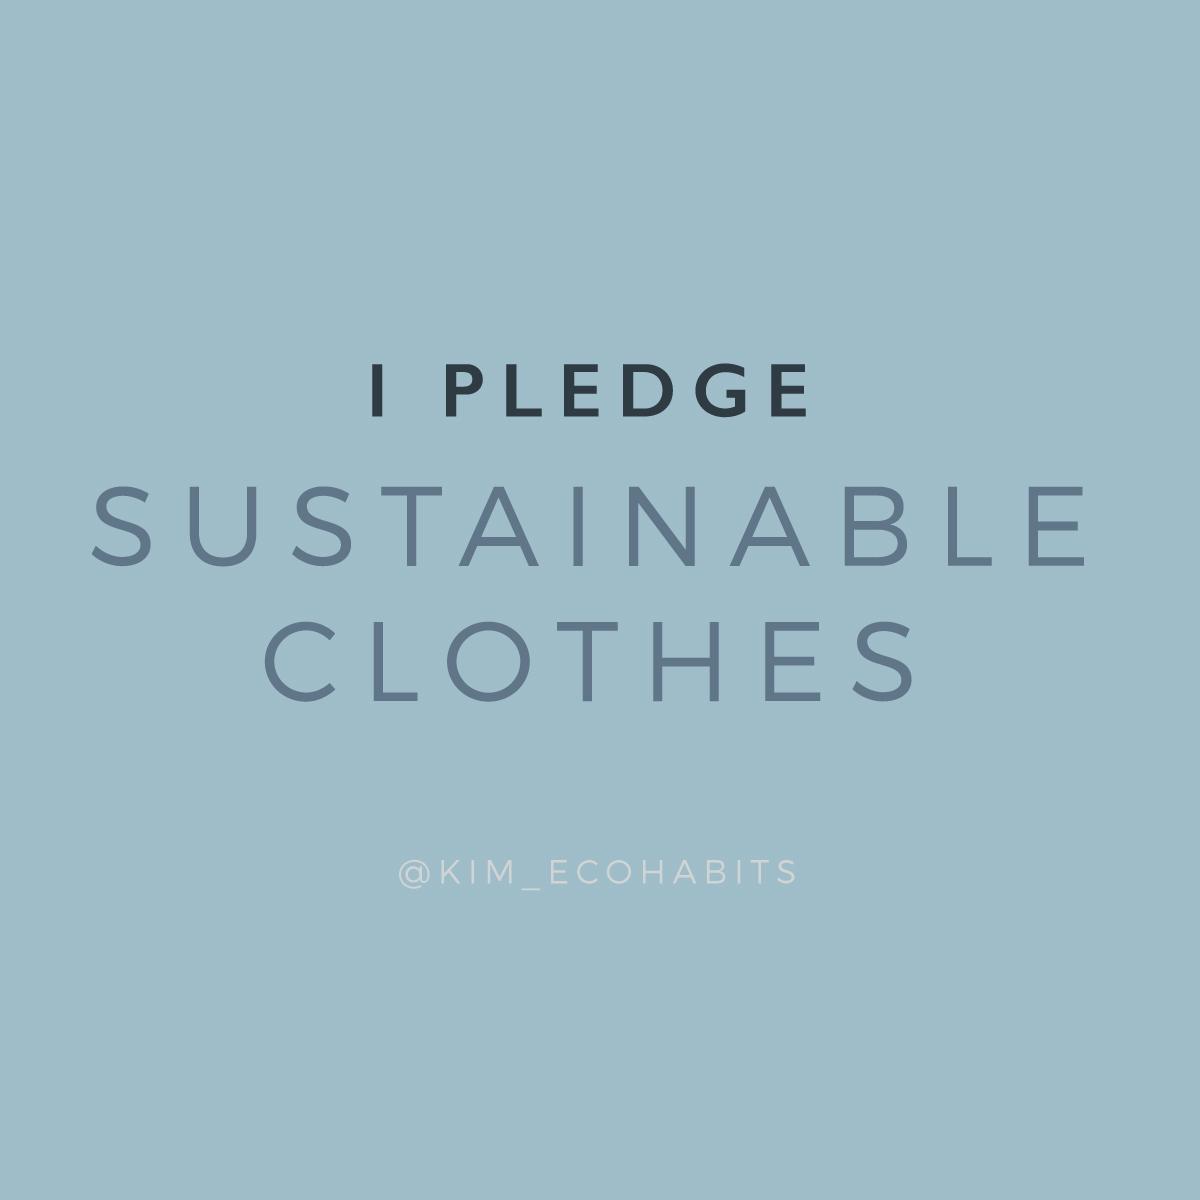 ClothesLESS_Pledge.jpg